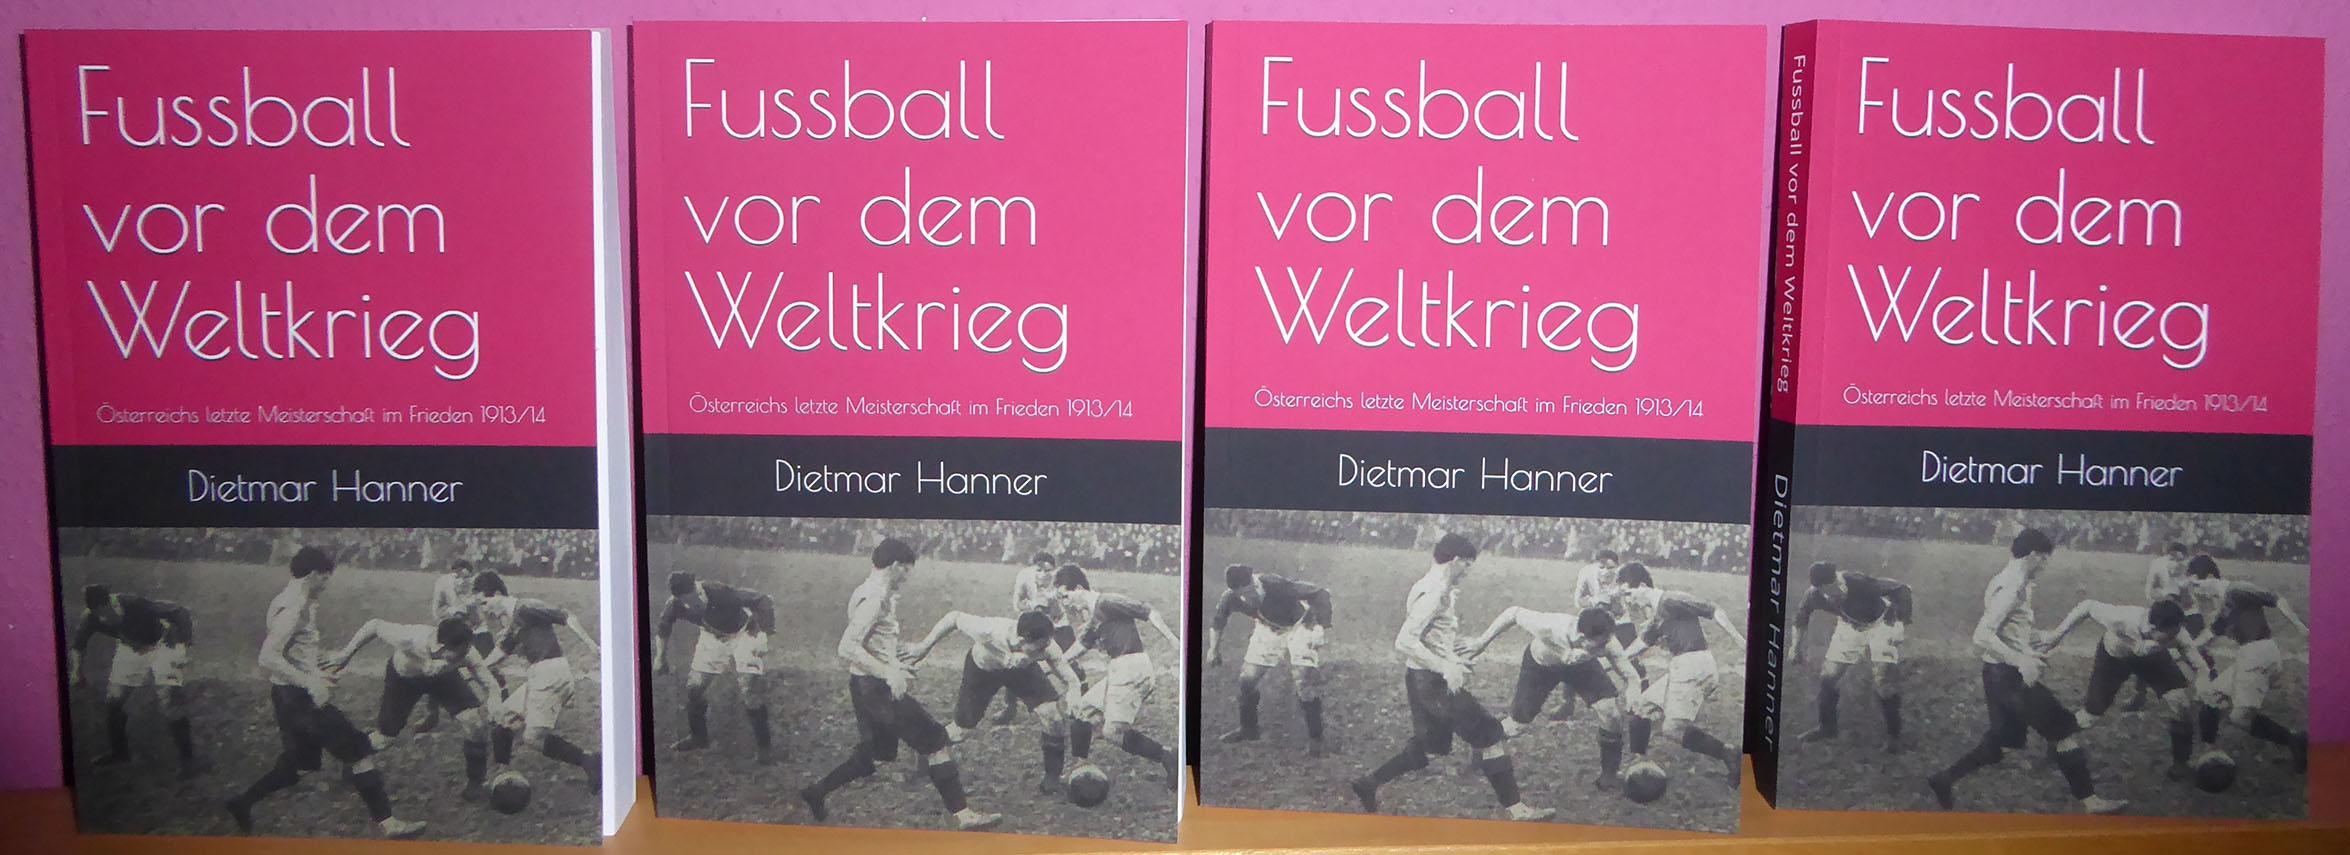 Fussball vor dem Weltkrieg